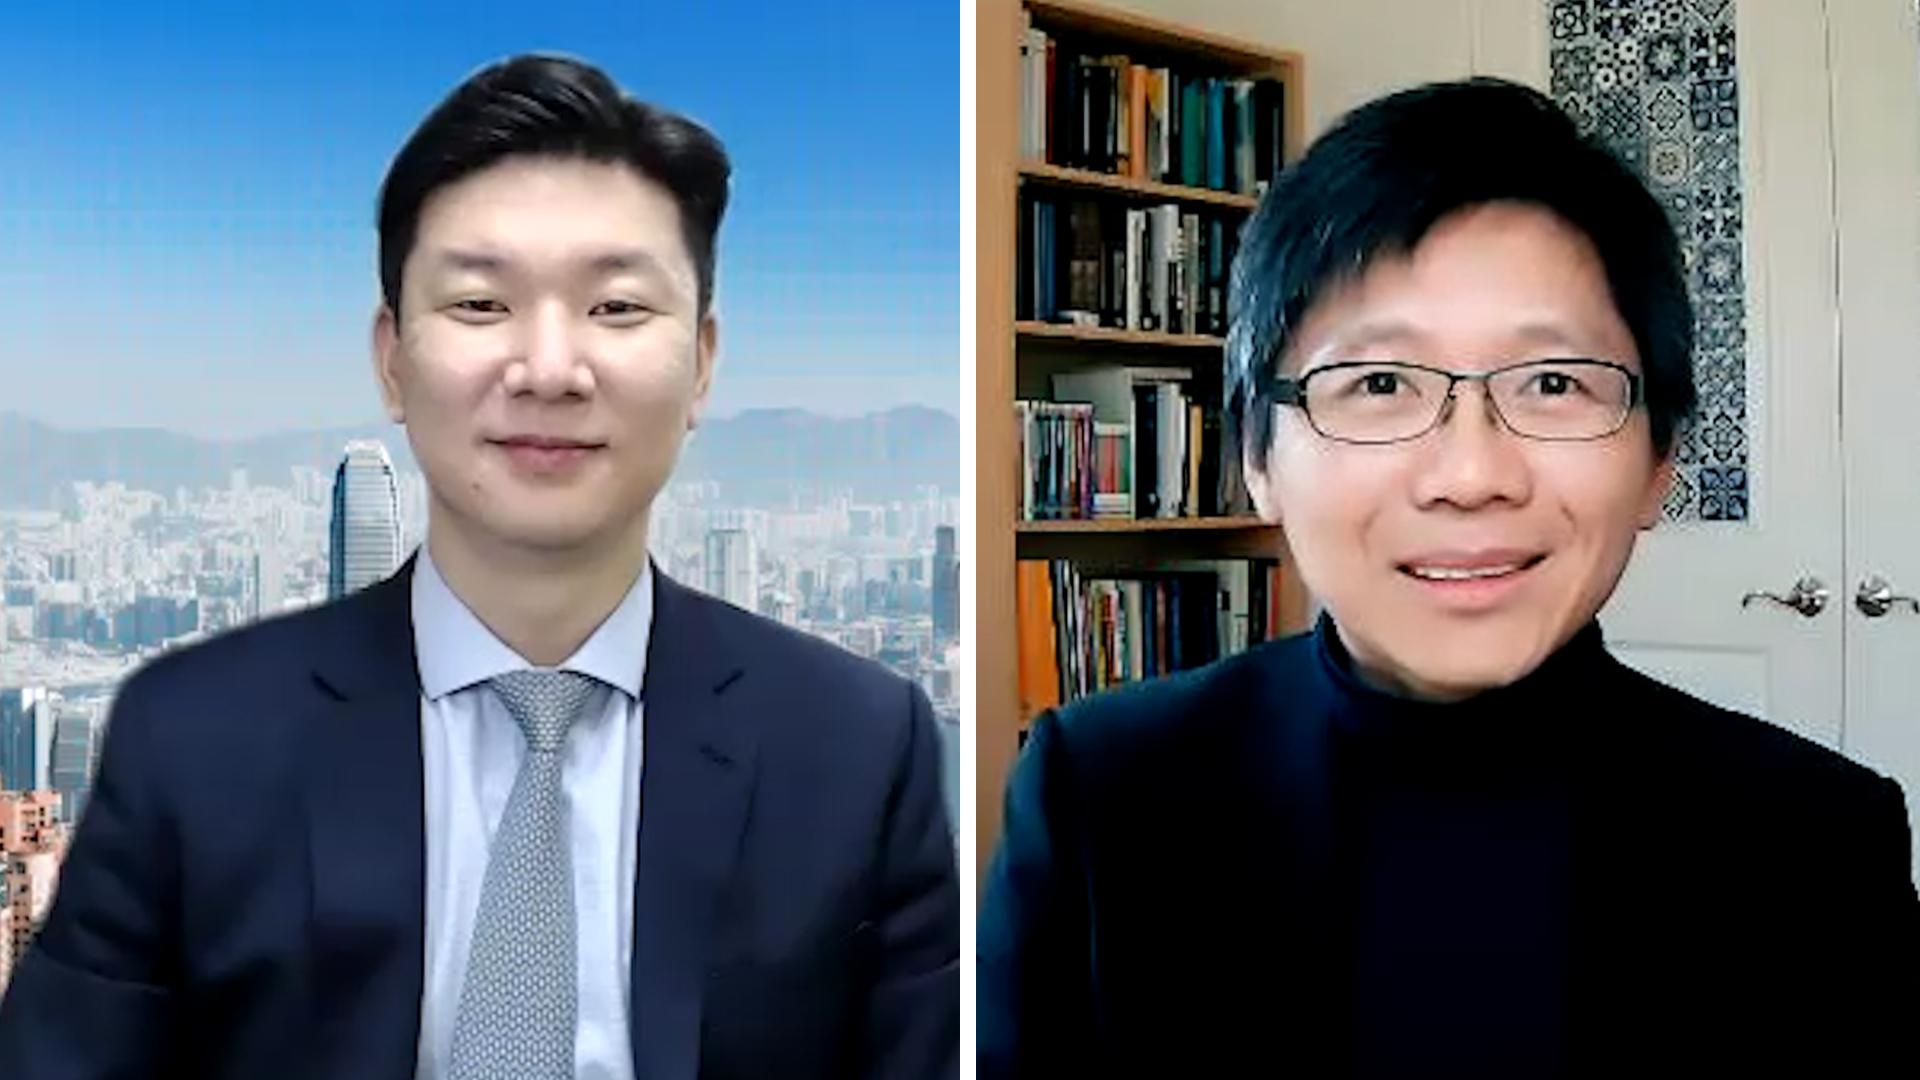 The ETF Show - AI, China & the Adoption of Active ETFs